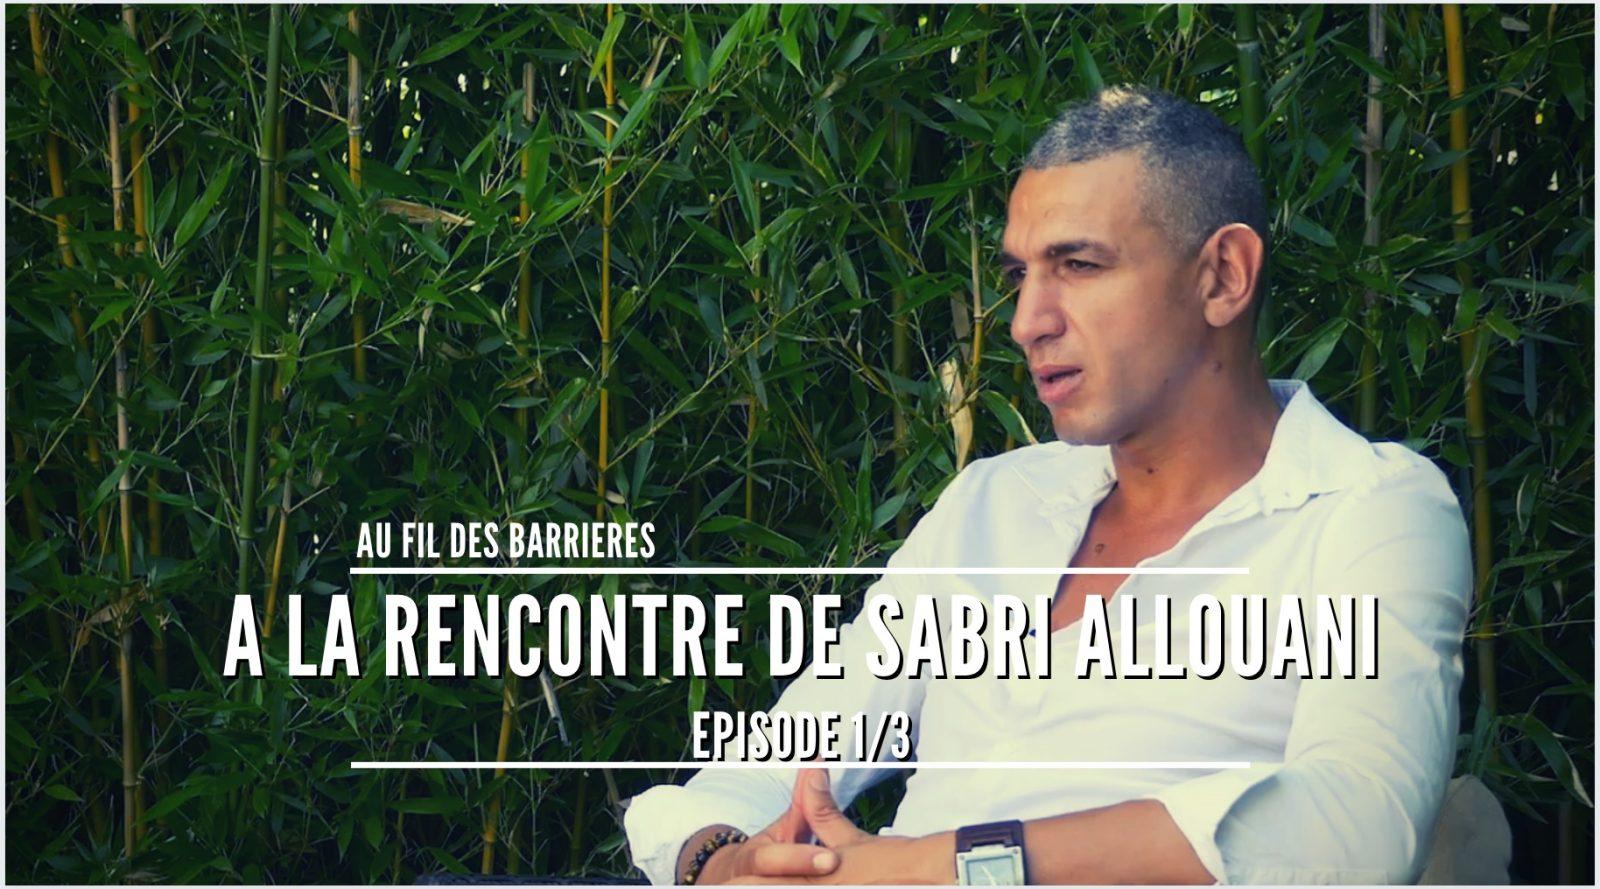 VIDEO // A la rencontre de Sabri Allouani – Episode 1/3